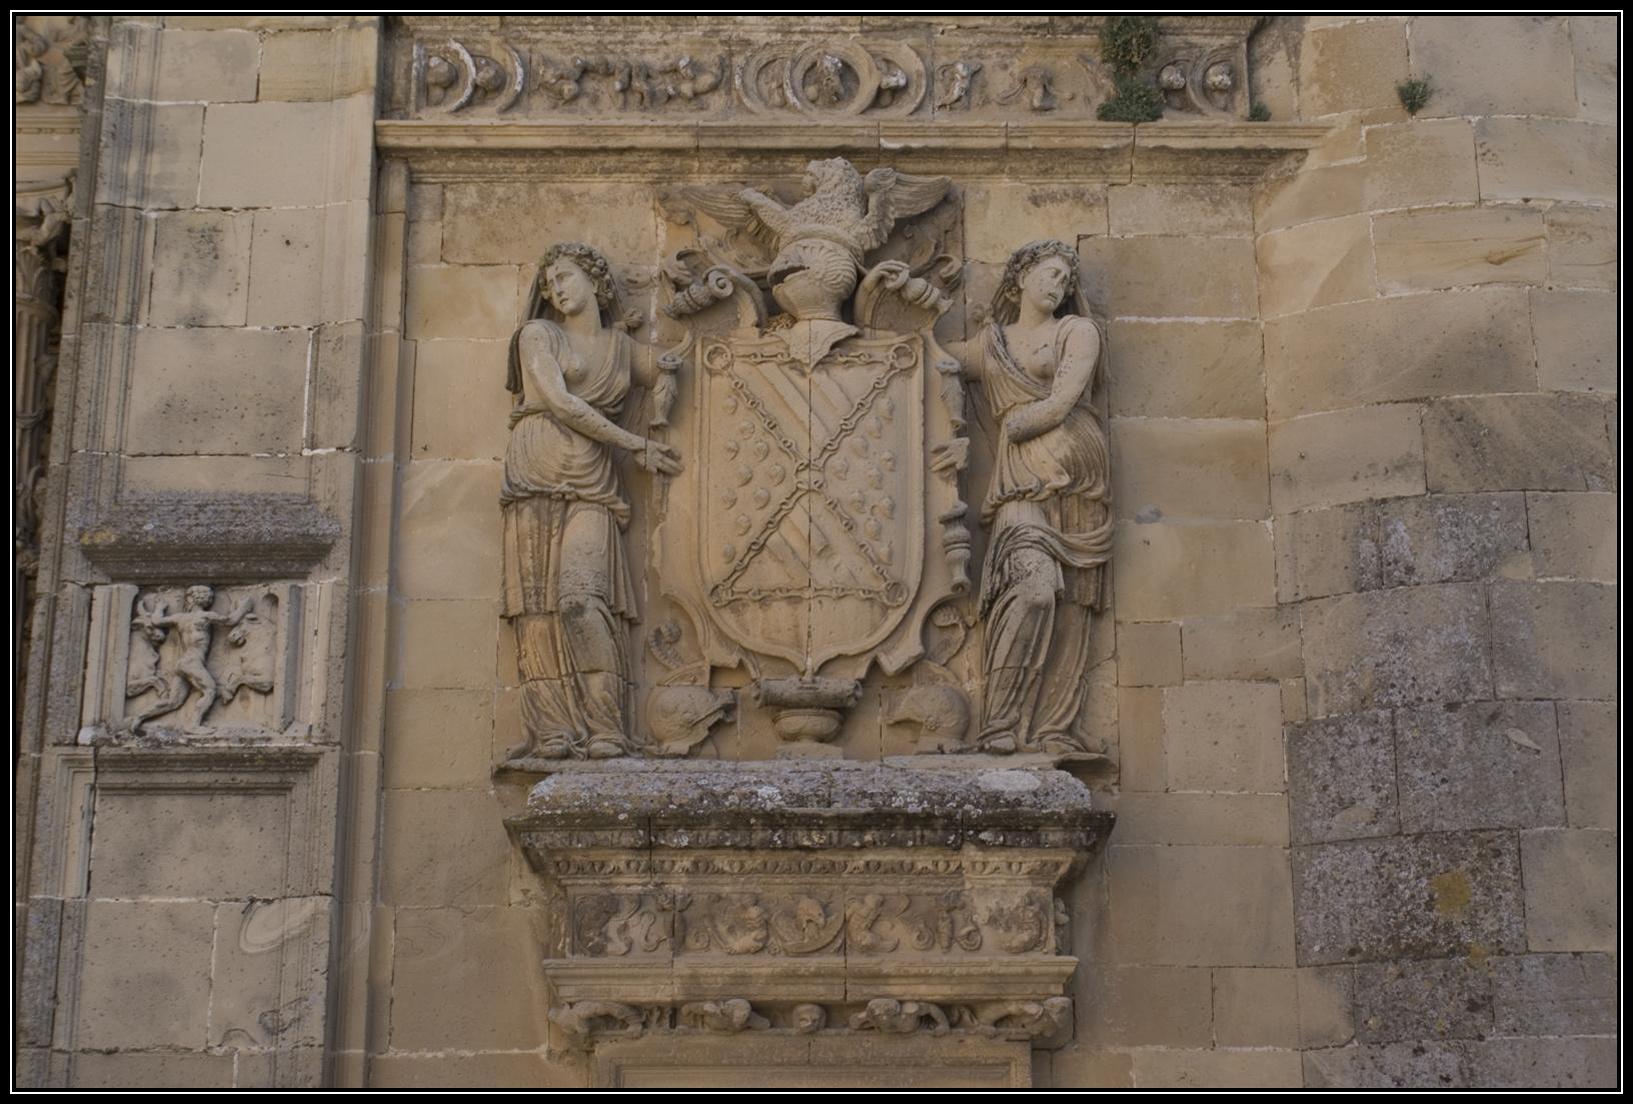 escudo de Maria de Mendoza en la Capilla del Salvador